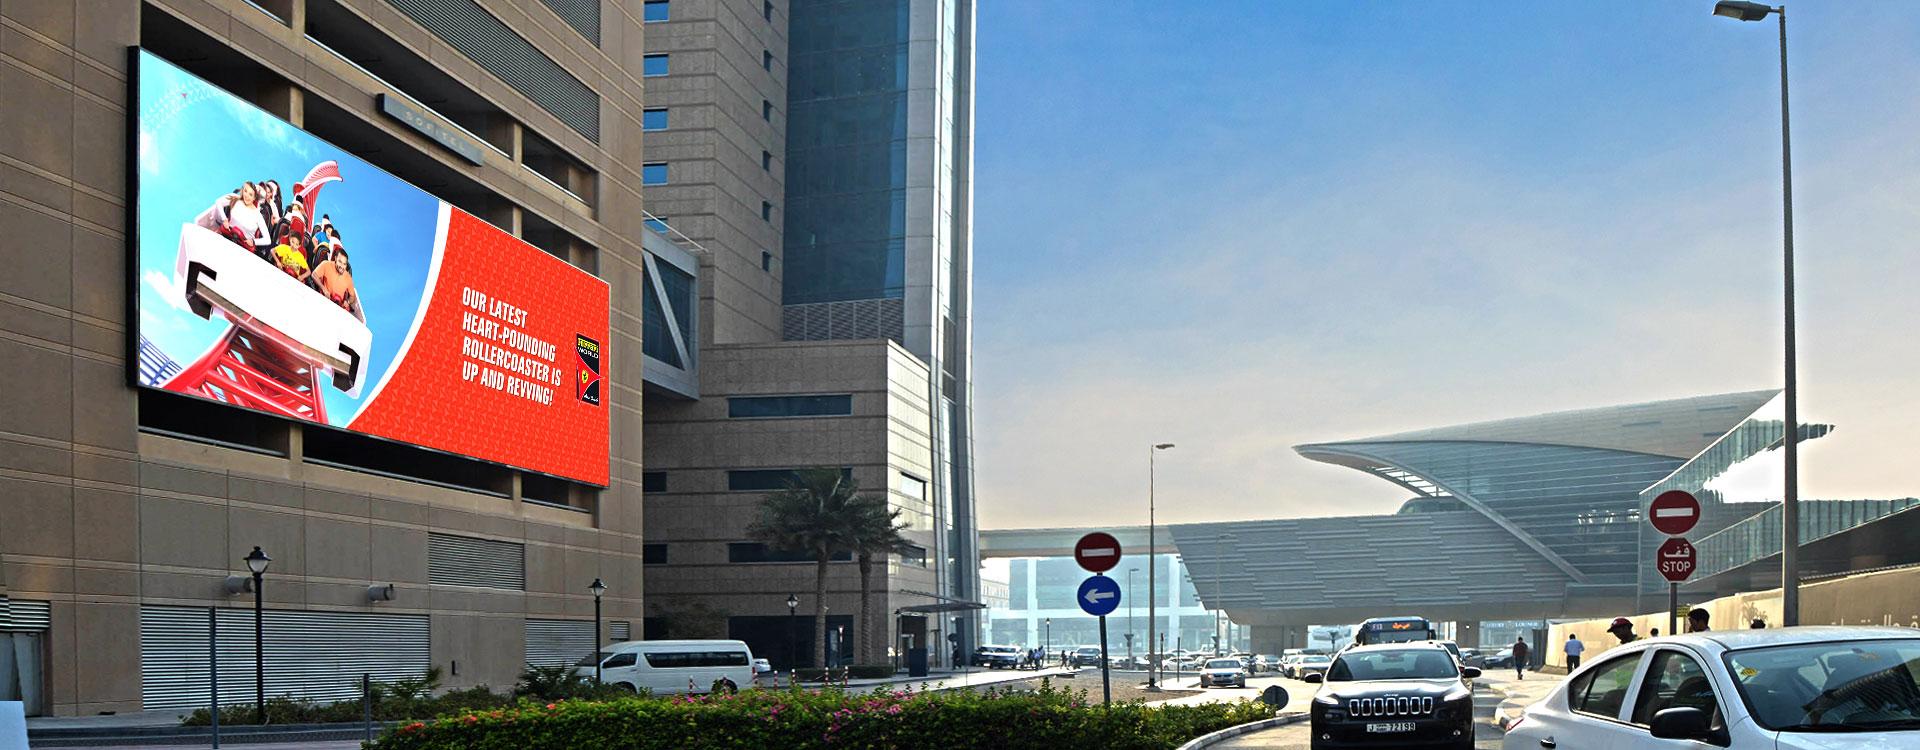 led display screen suppliers in dubai, UAE